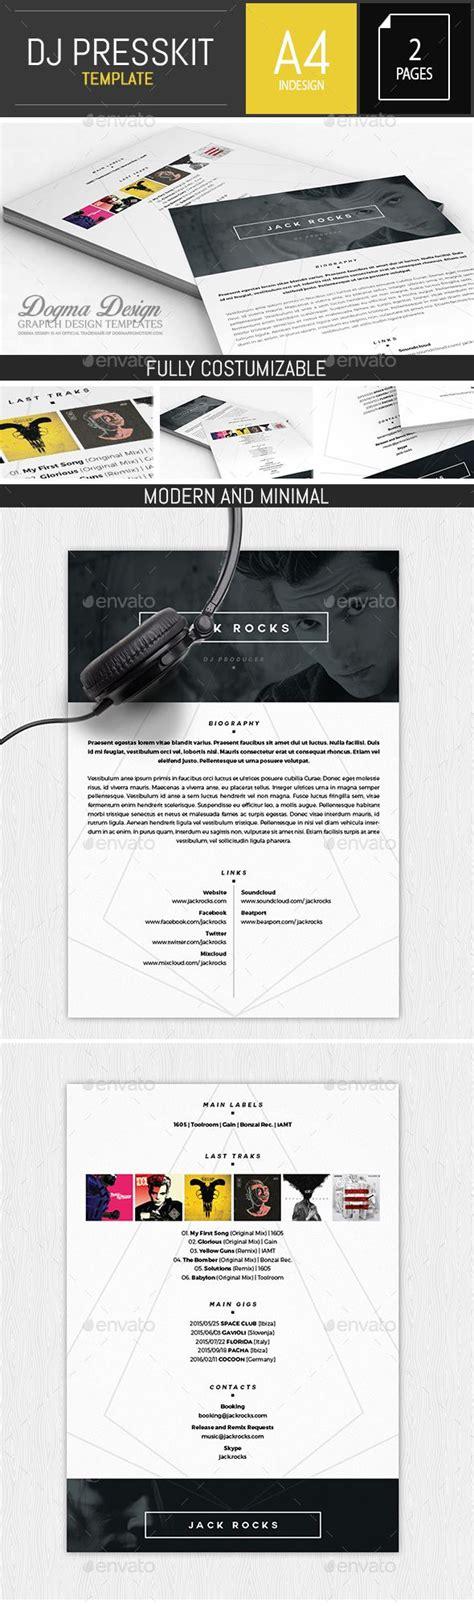 press kit template 7 best davidson ospina epk press kit images on